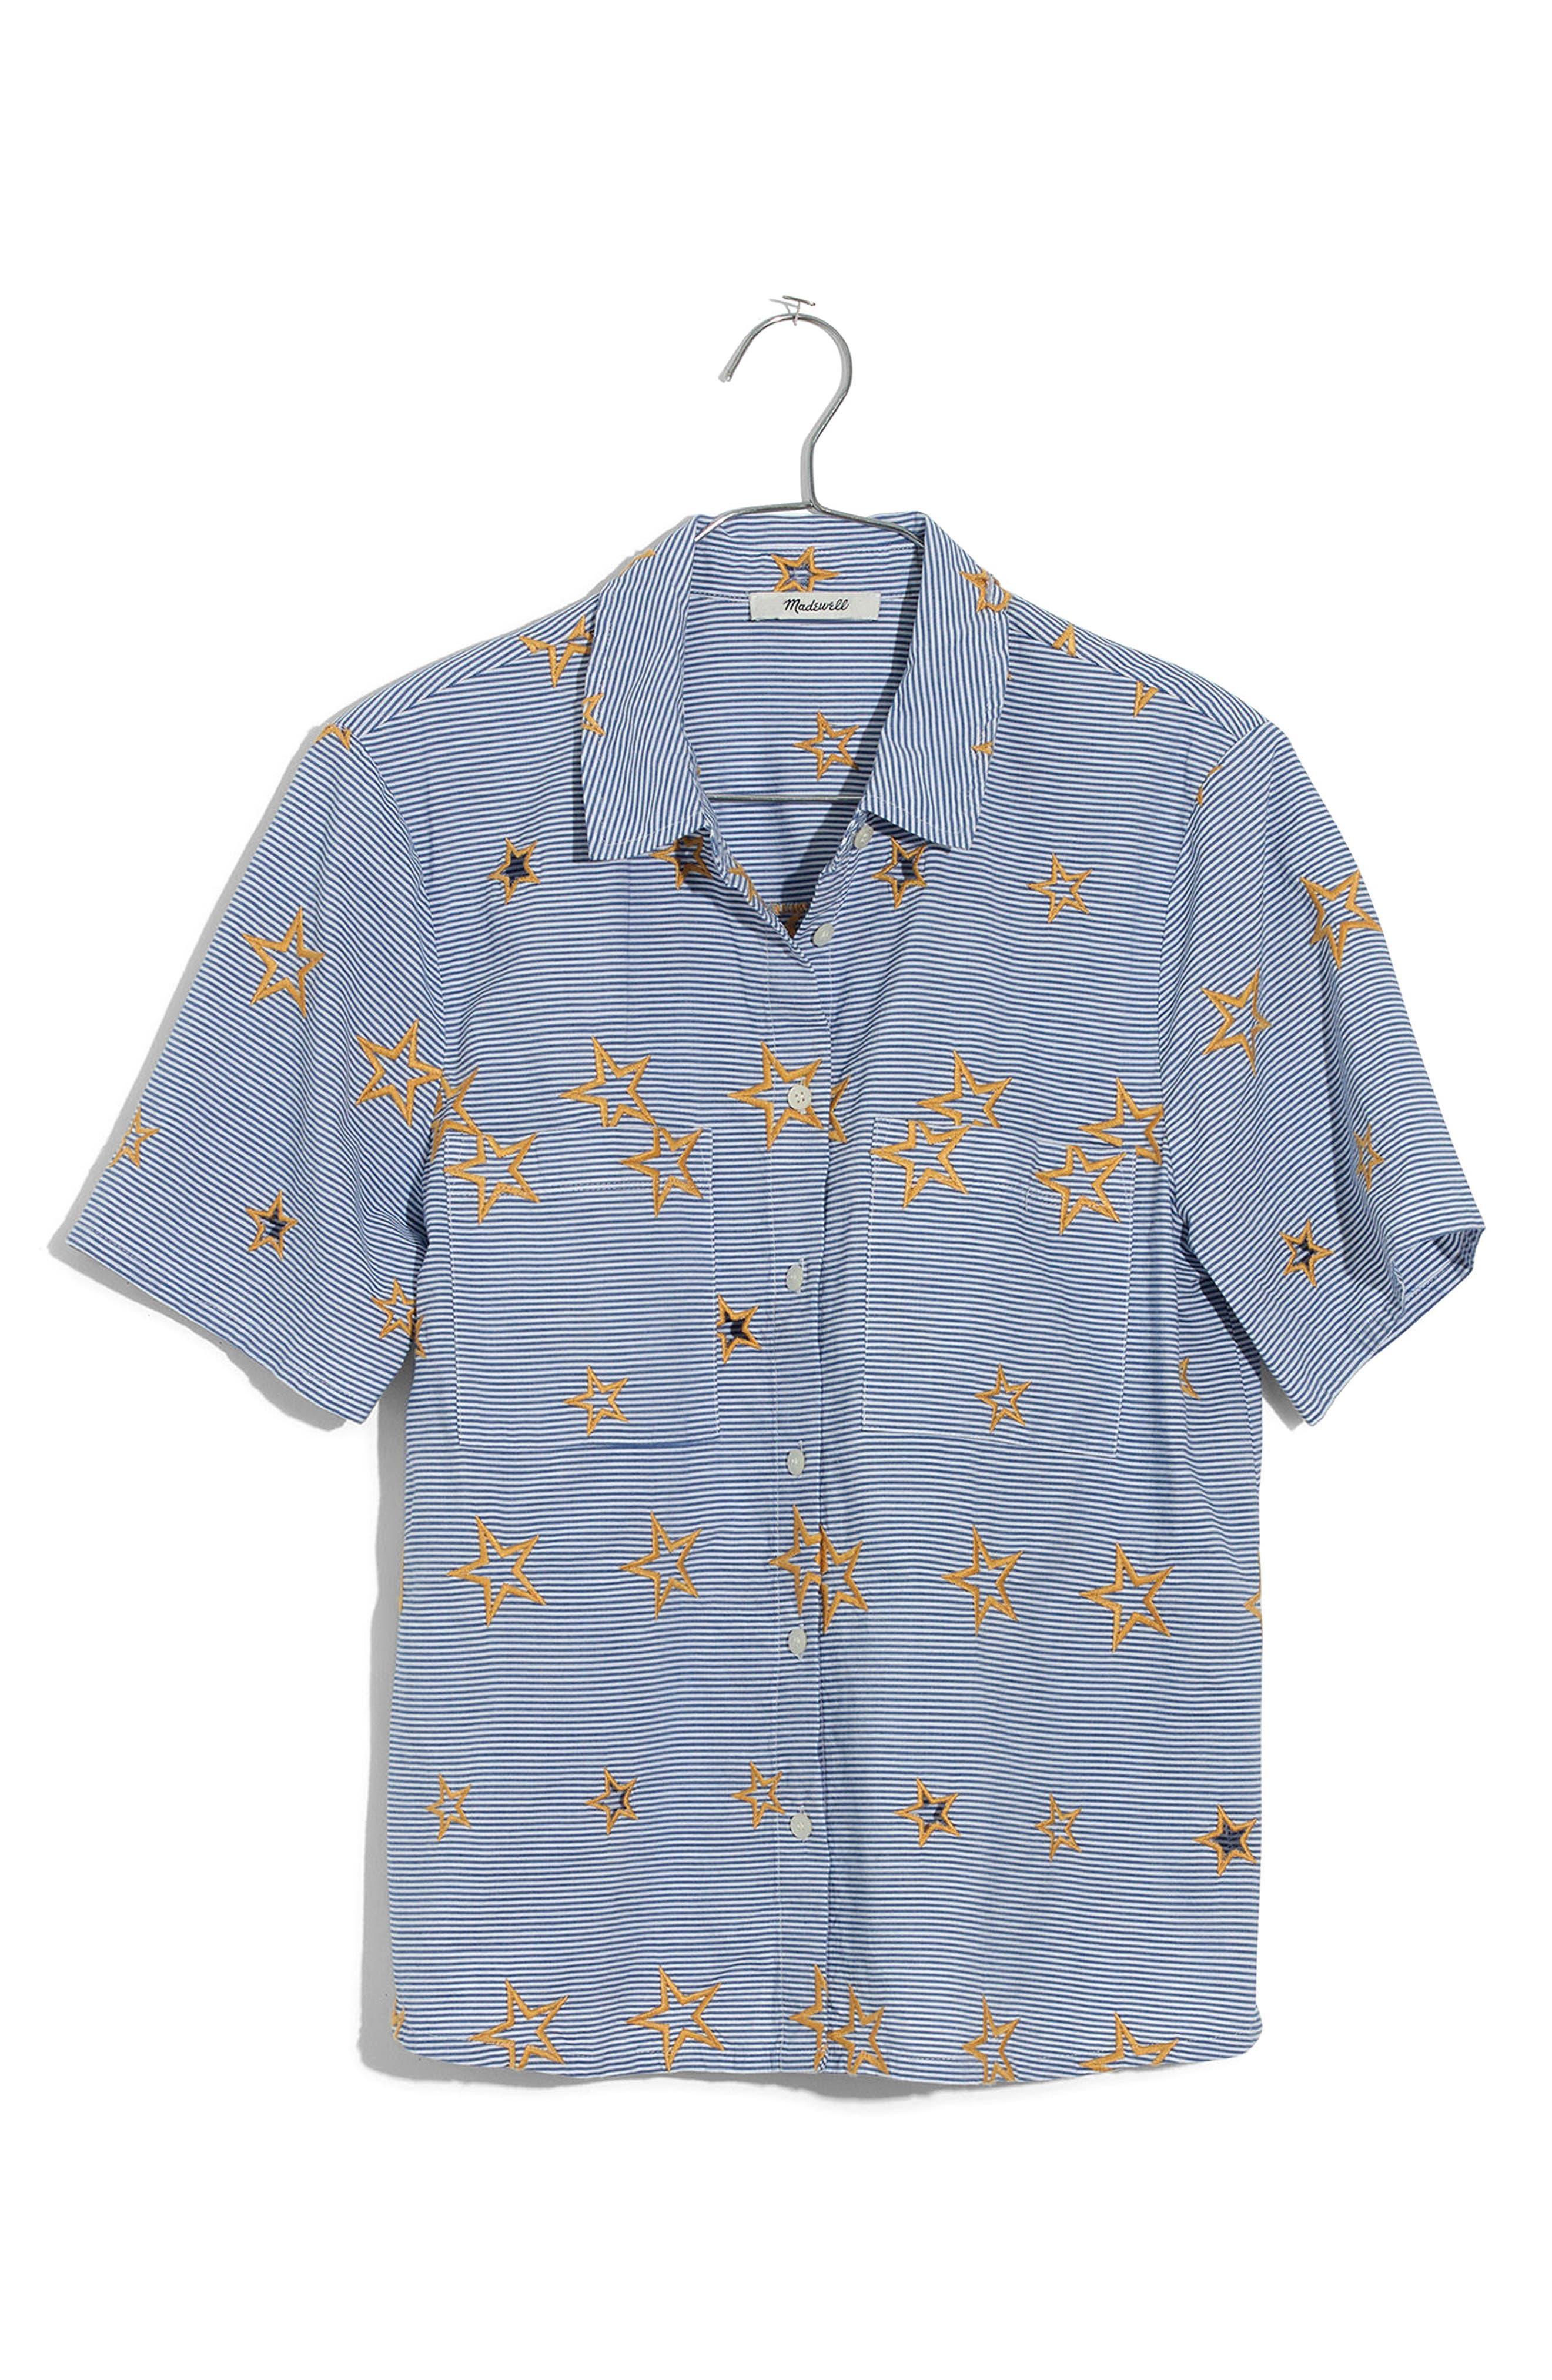 Star Embroidered Stripe Shirt,                             Alternate thumbnail 4, color,                             400